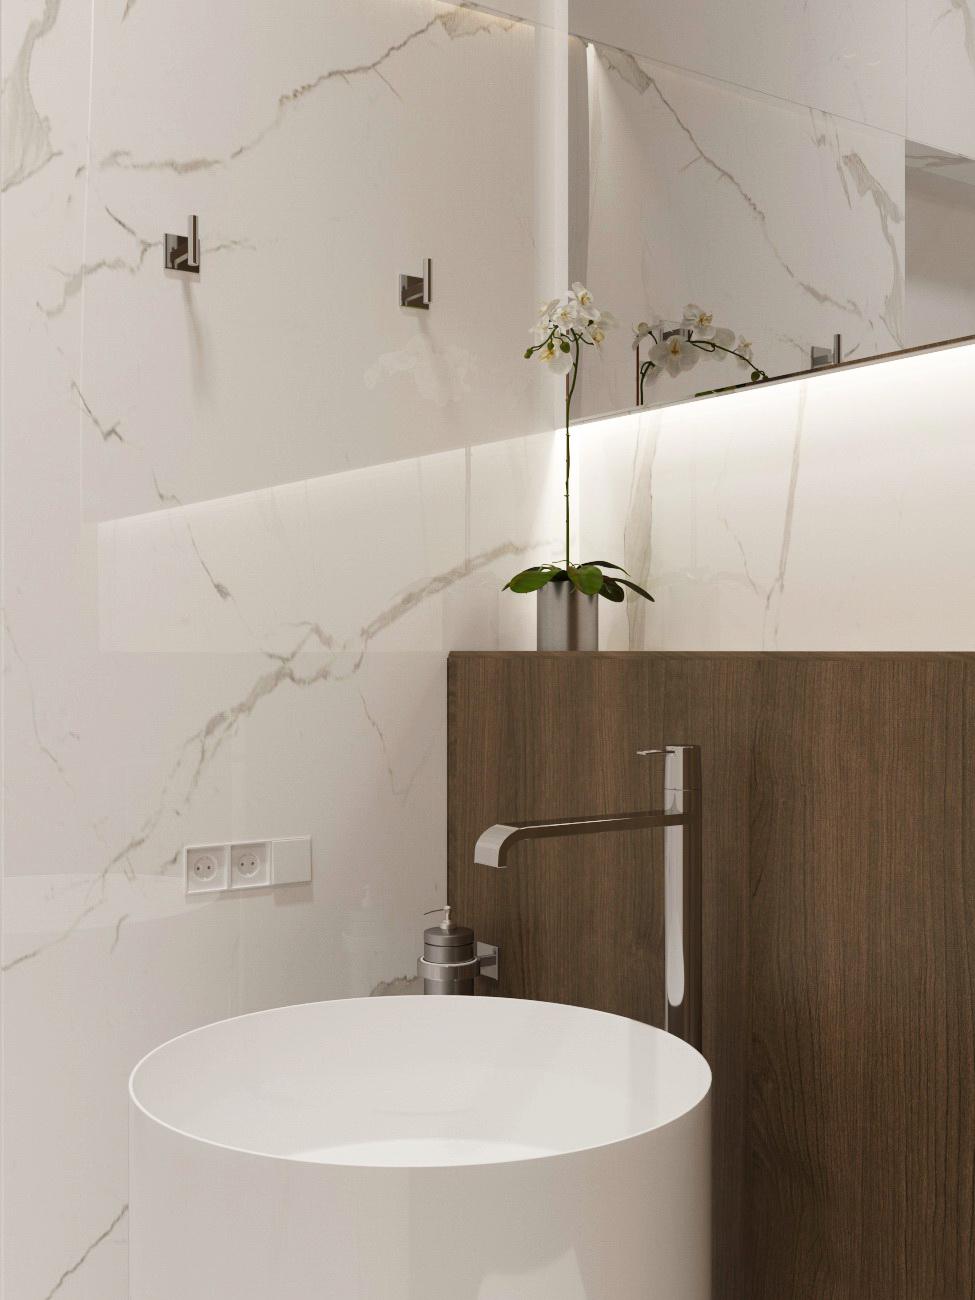 Дизайн интерьера туалета санузла